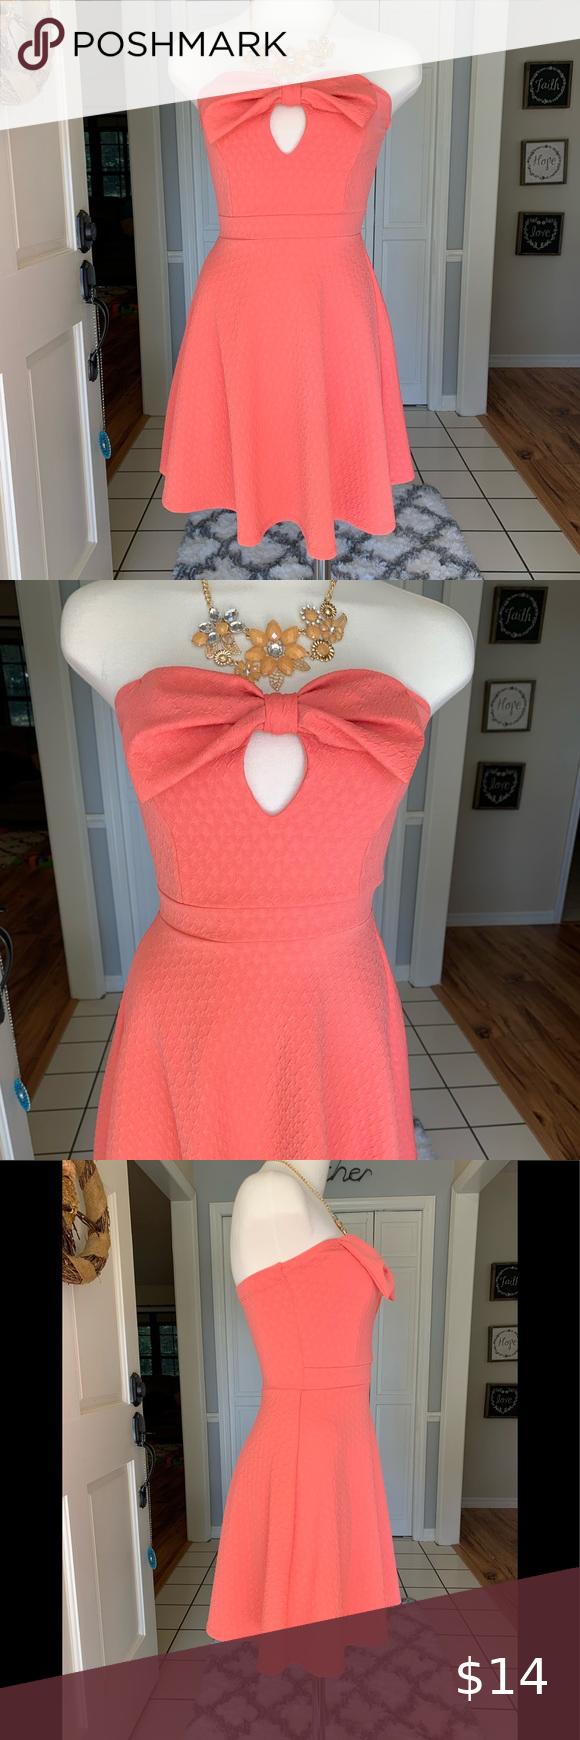 Salmon Summer Dress Summer Dresses Dresses Clothes Design [ 1740 x 580 Pixel ]